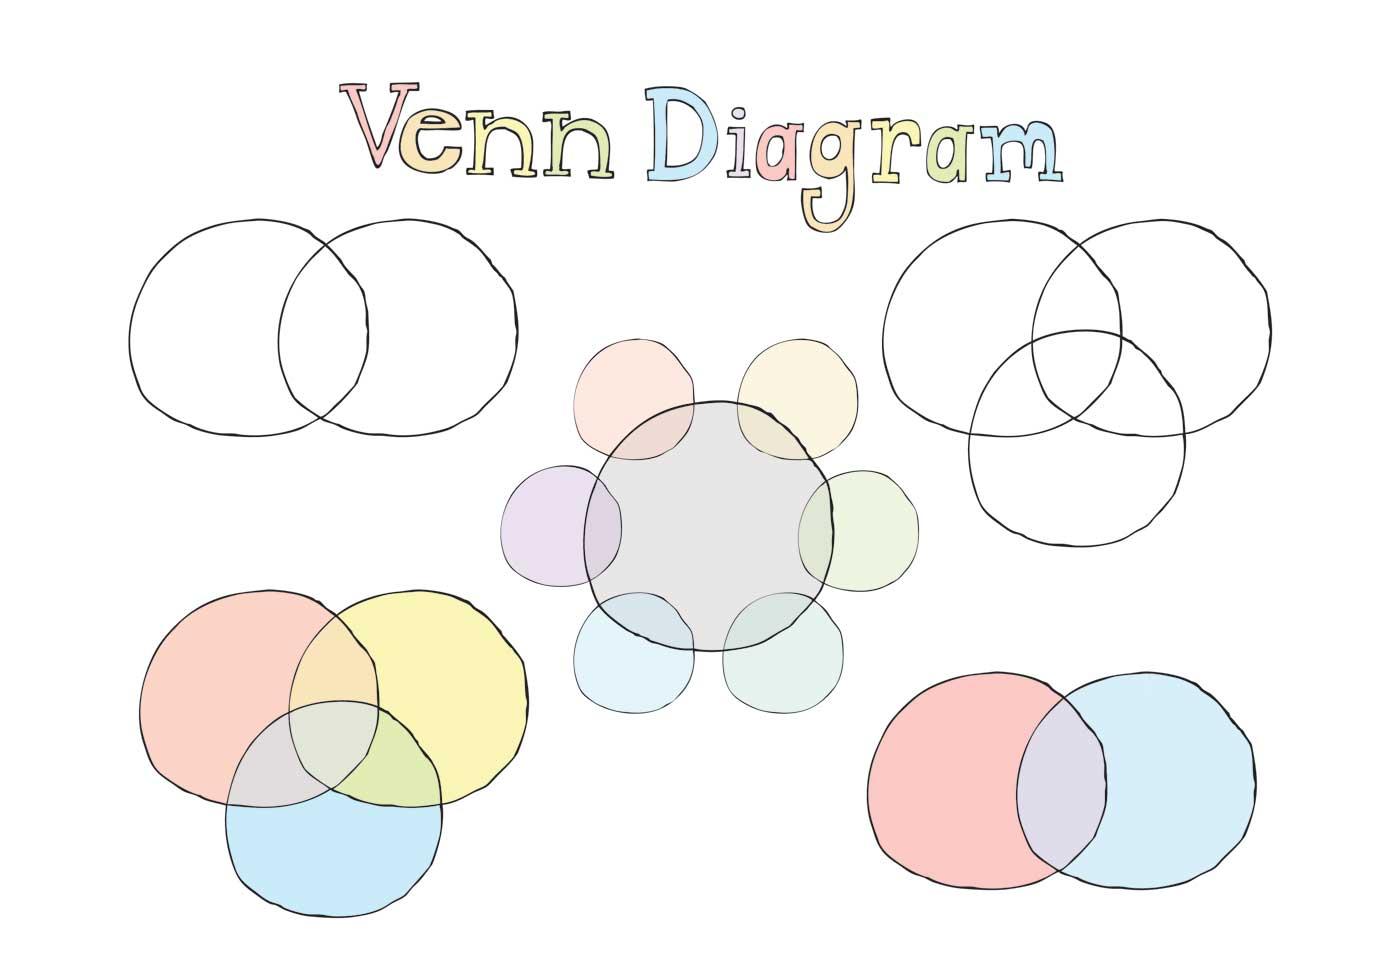 Free Venn Diagram Vector Series